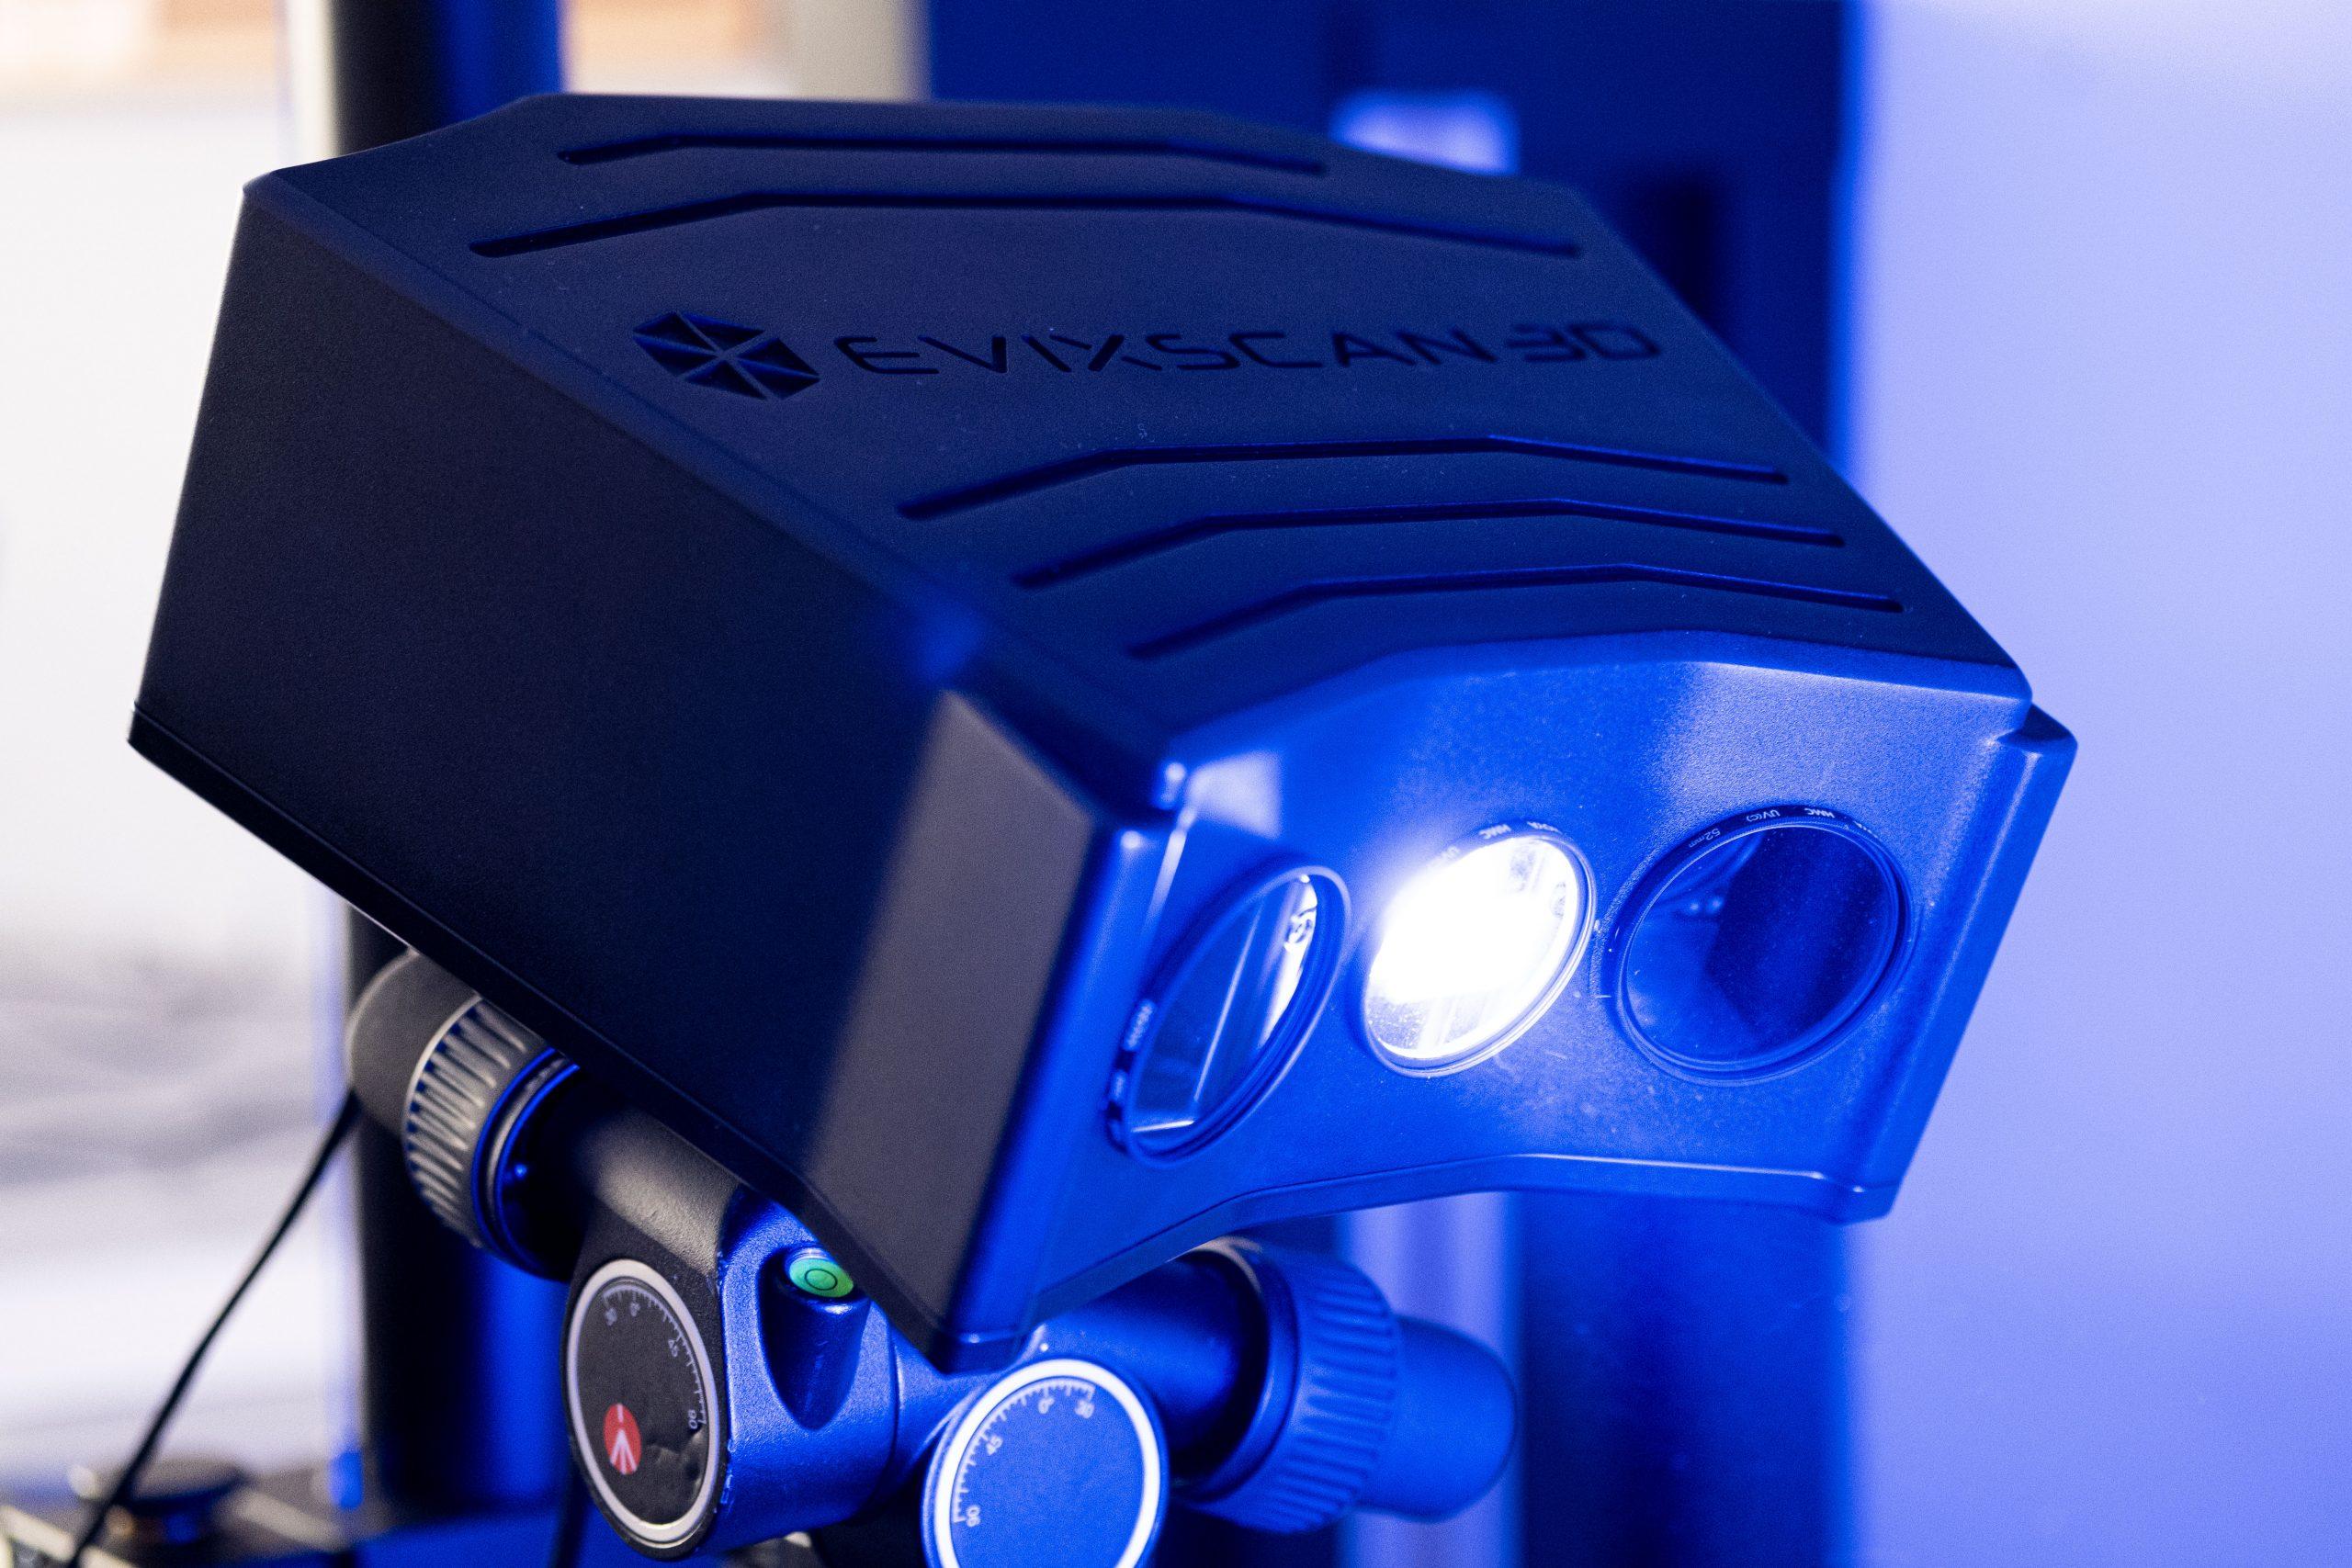 The eviXscan FinePrecision 3D scanner. Photo via Evatronix.